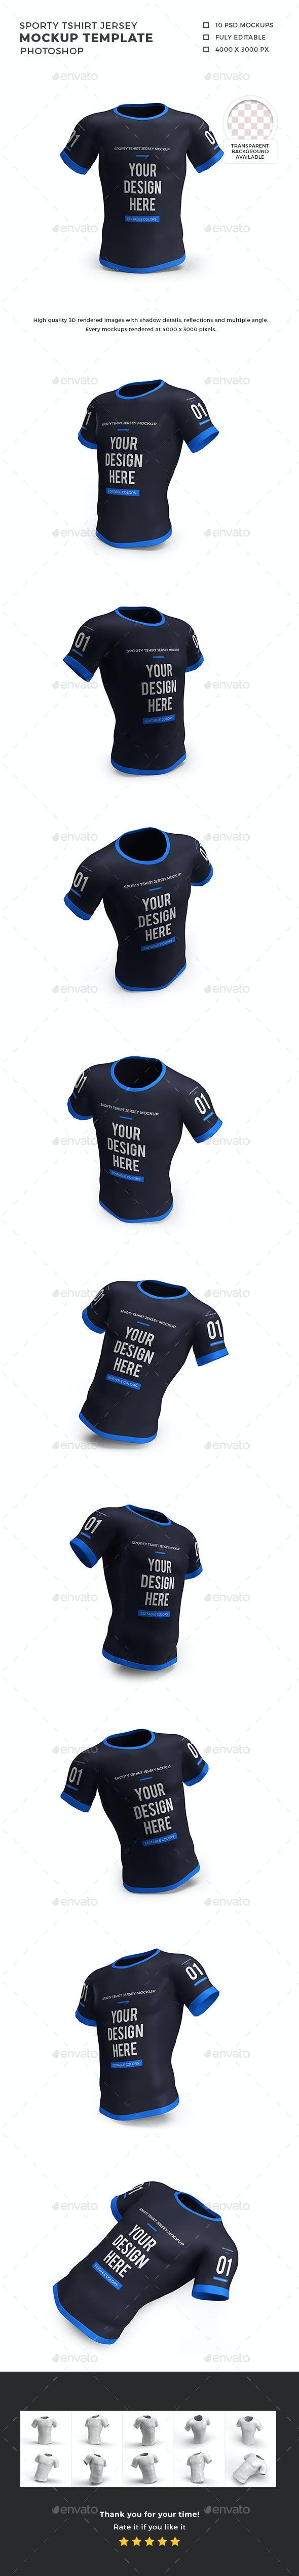 Sporty Tshirt Jersey Mockup Template Set - T-shirts Apparel